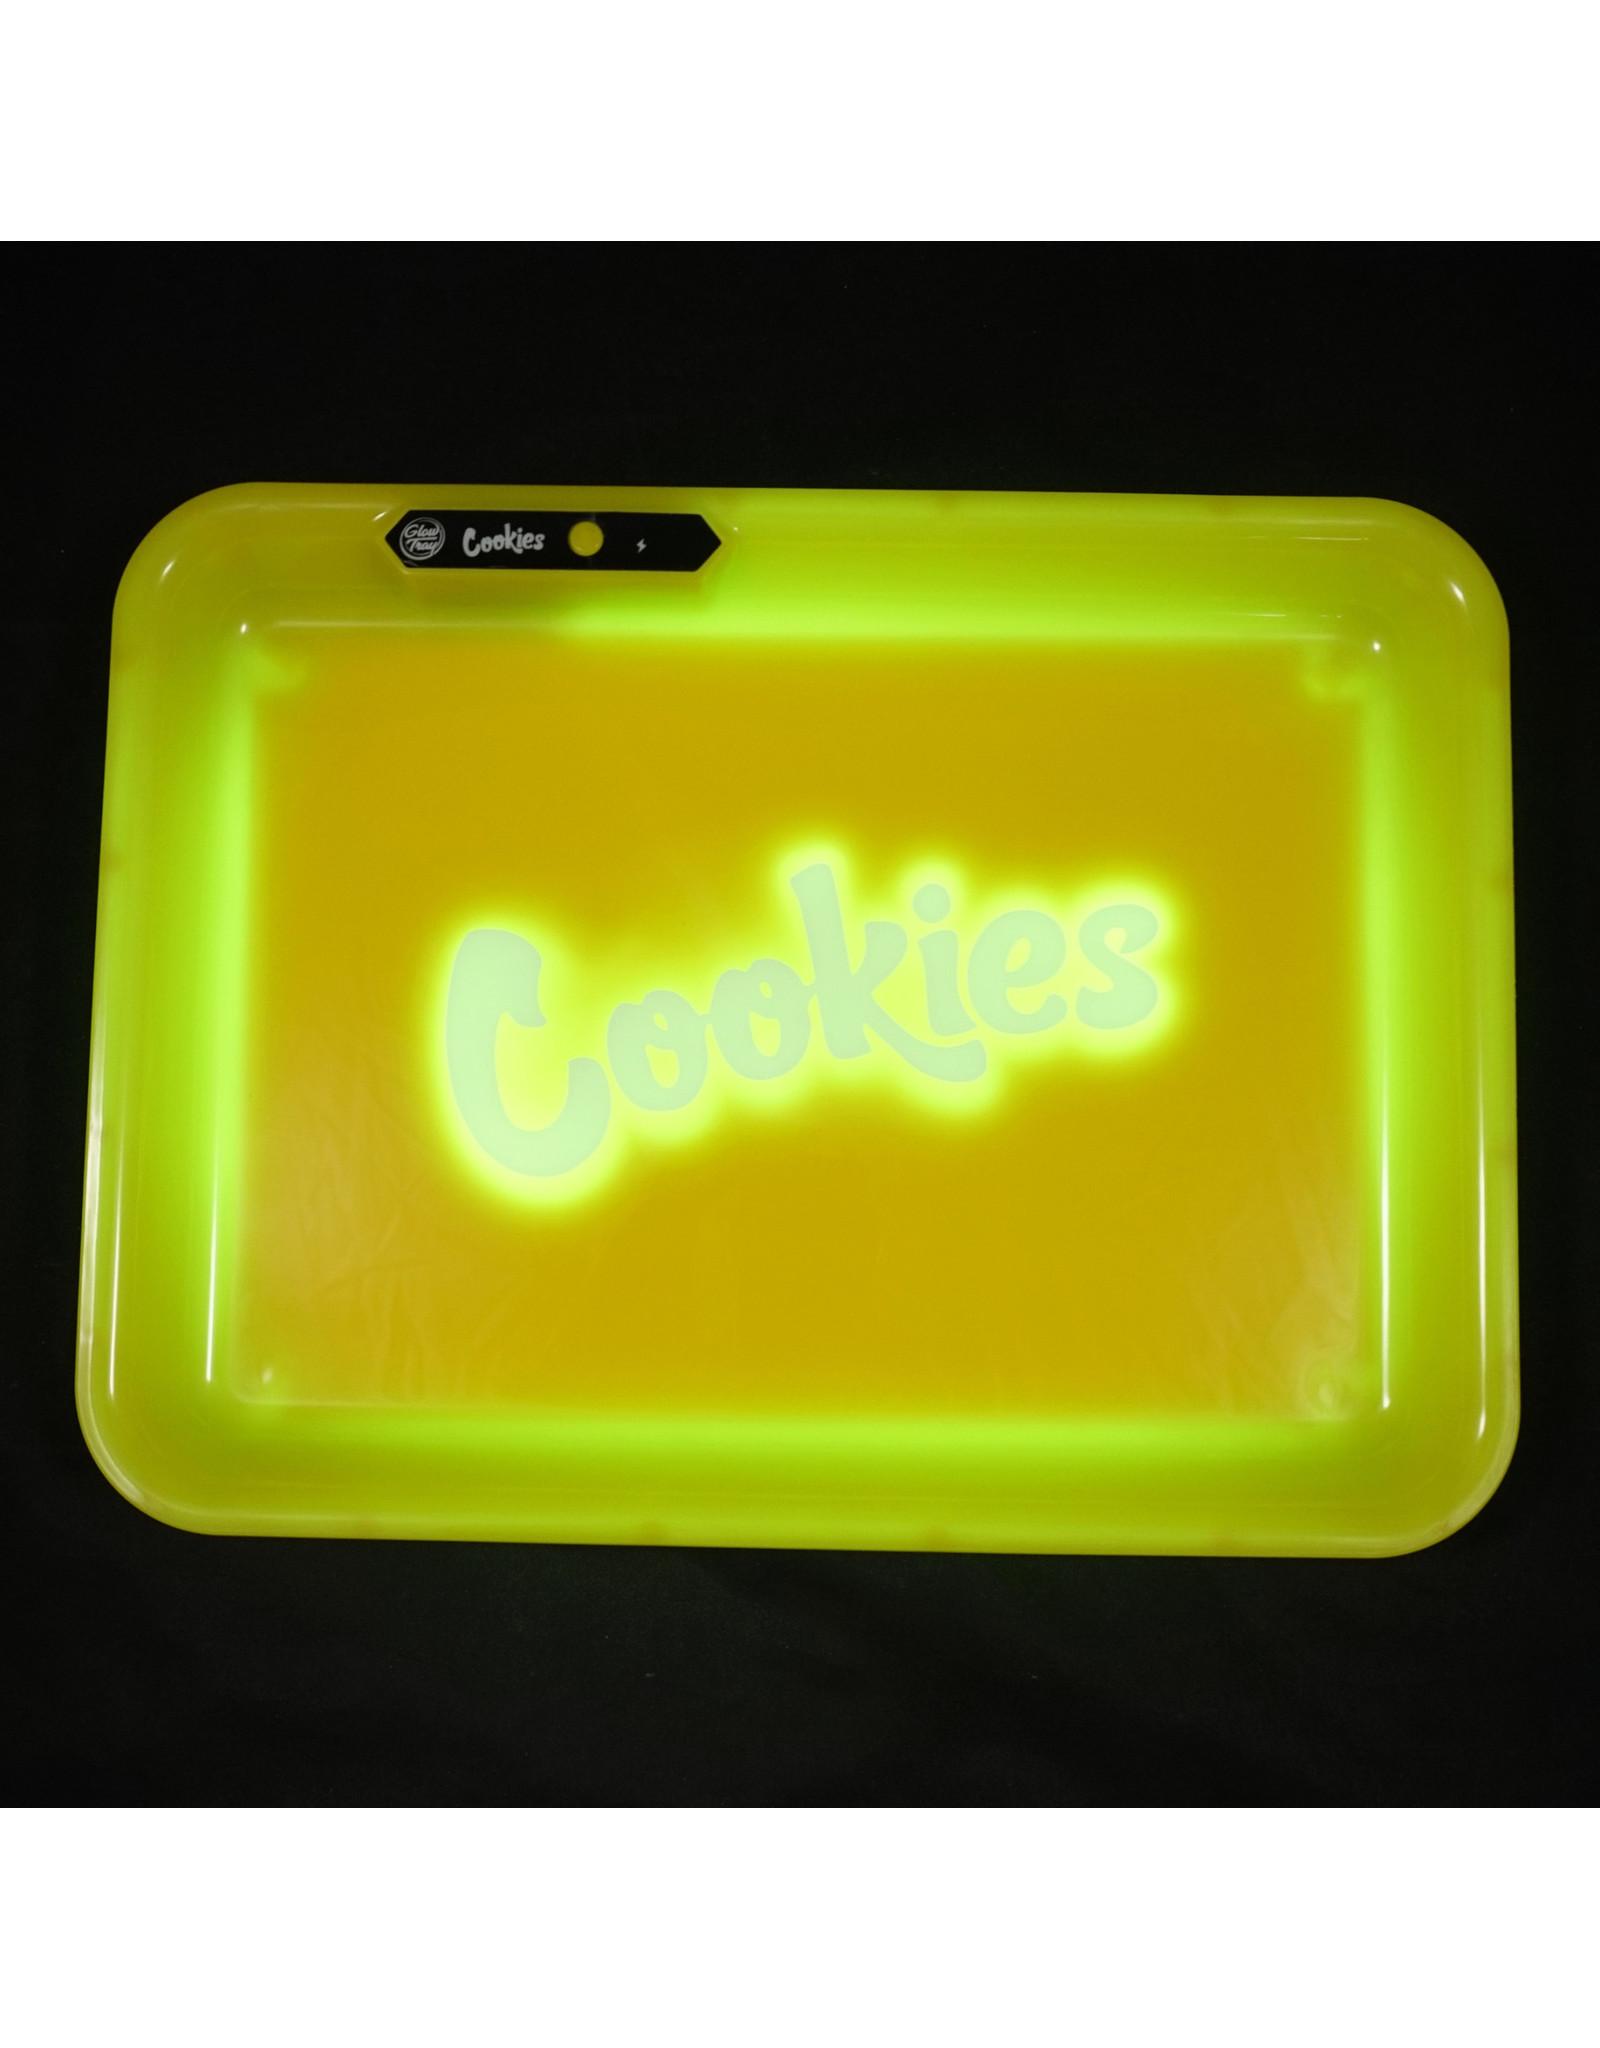 Cookies LED Glow Medium Rolling Tray - Yellow